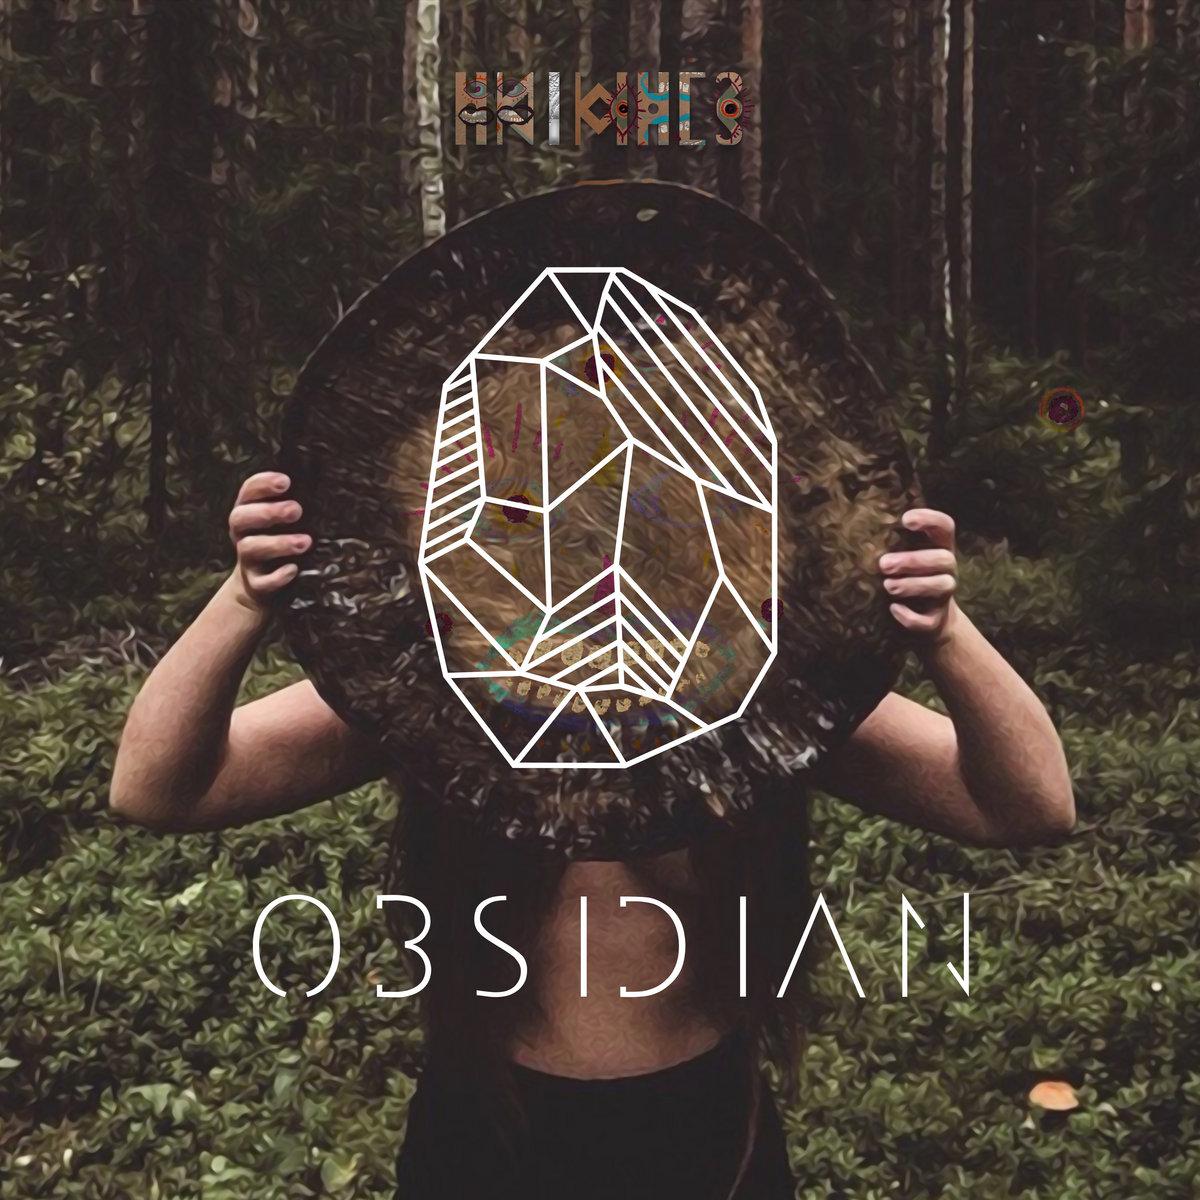 03sidian - Animals - Supranu Records - Bandcamp - player - 2020 - Sa Scena Sarda